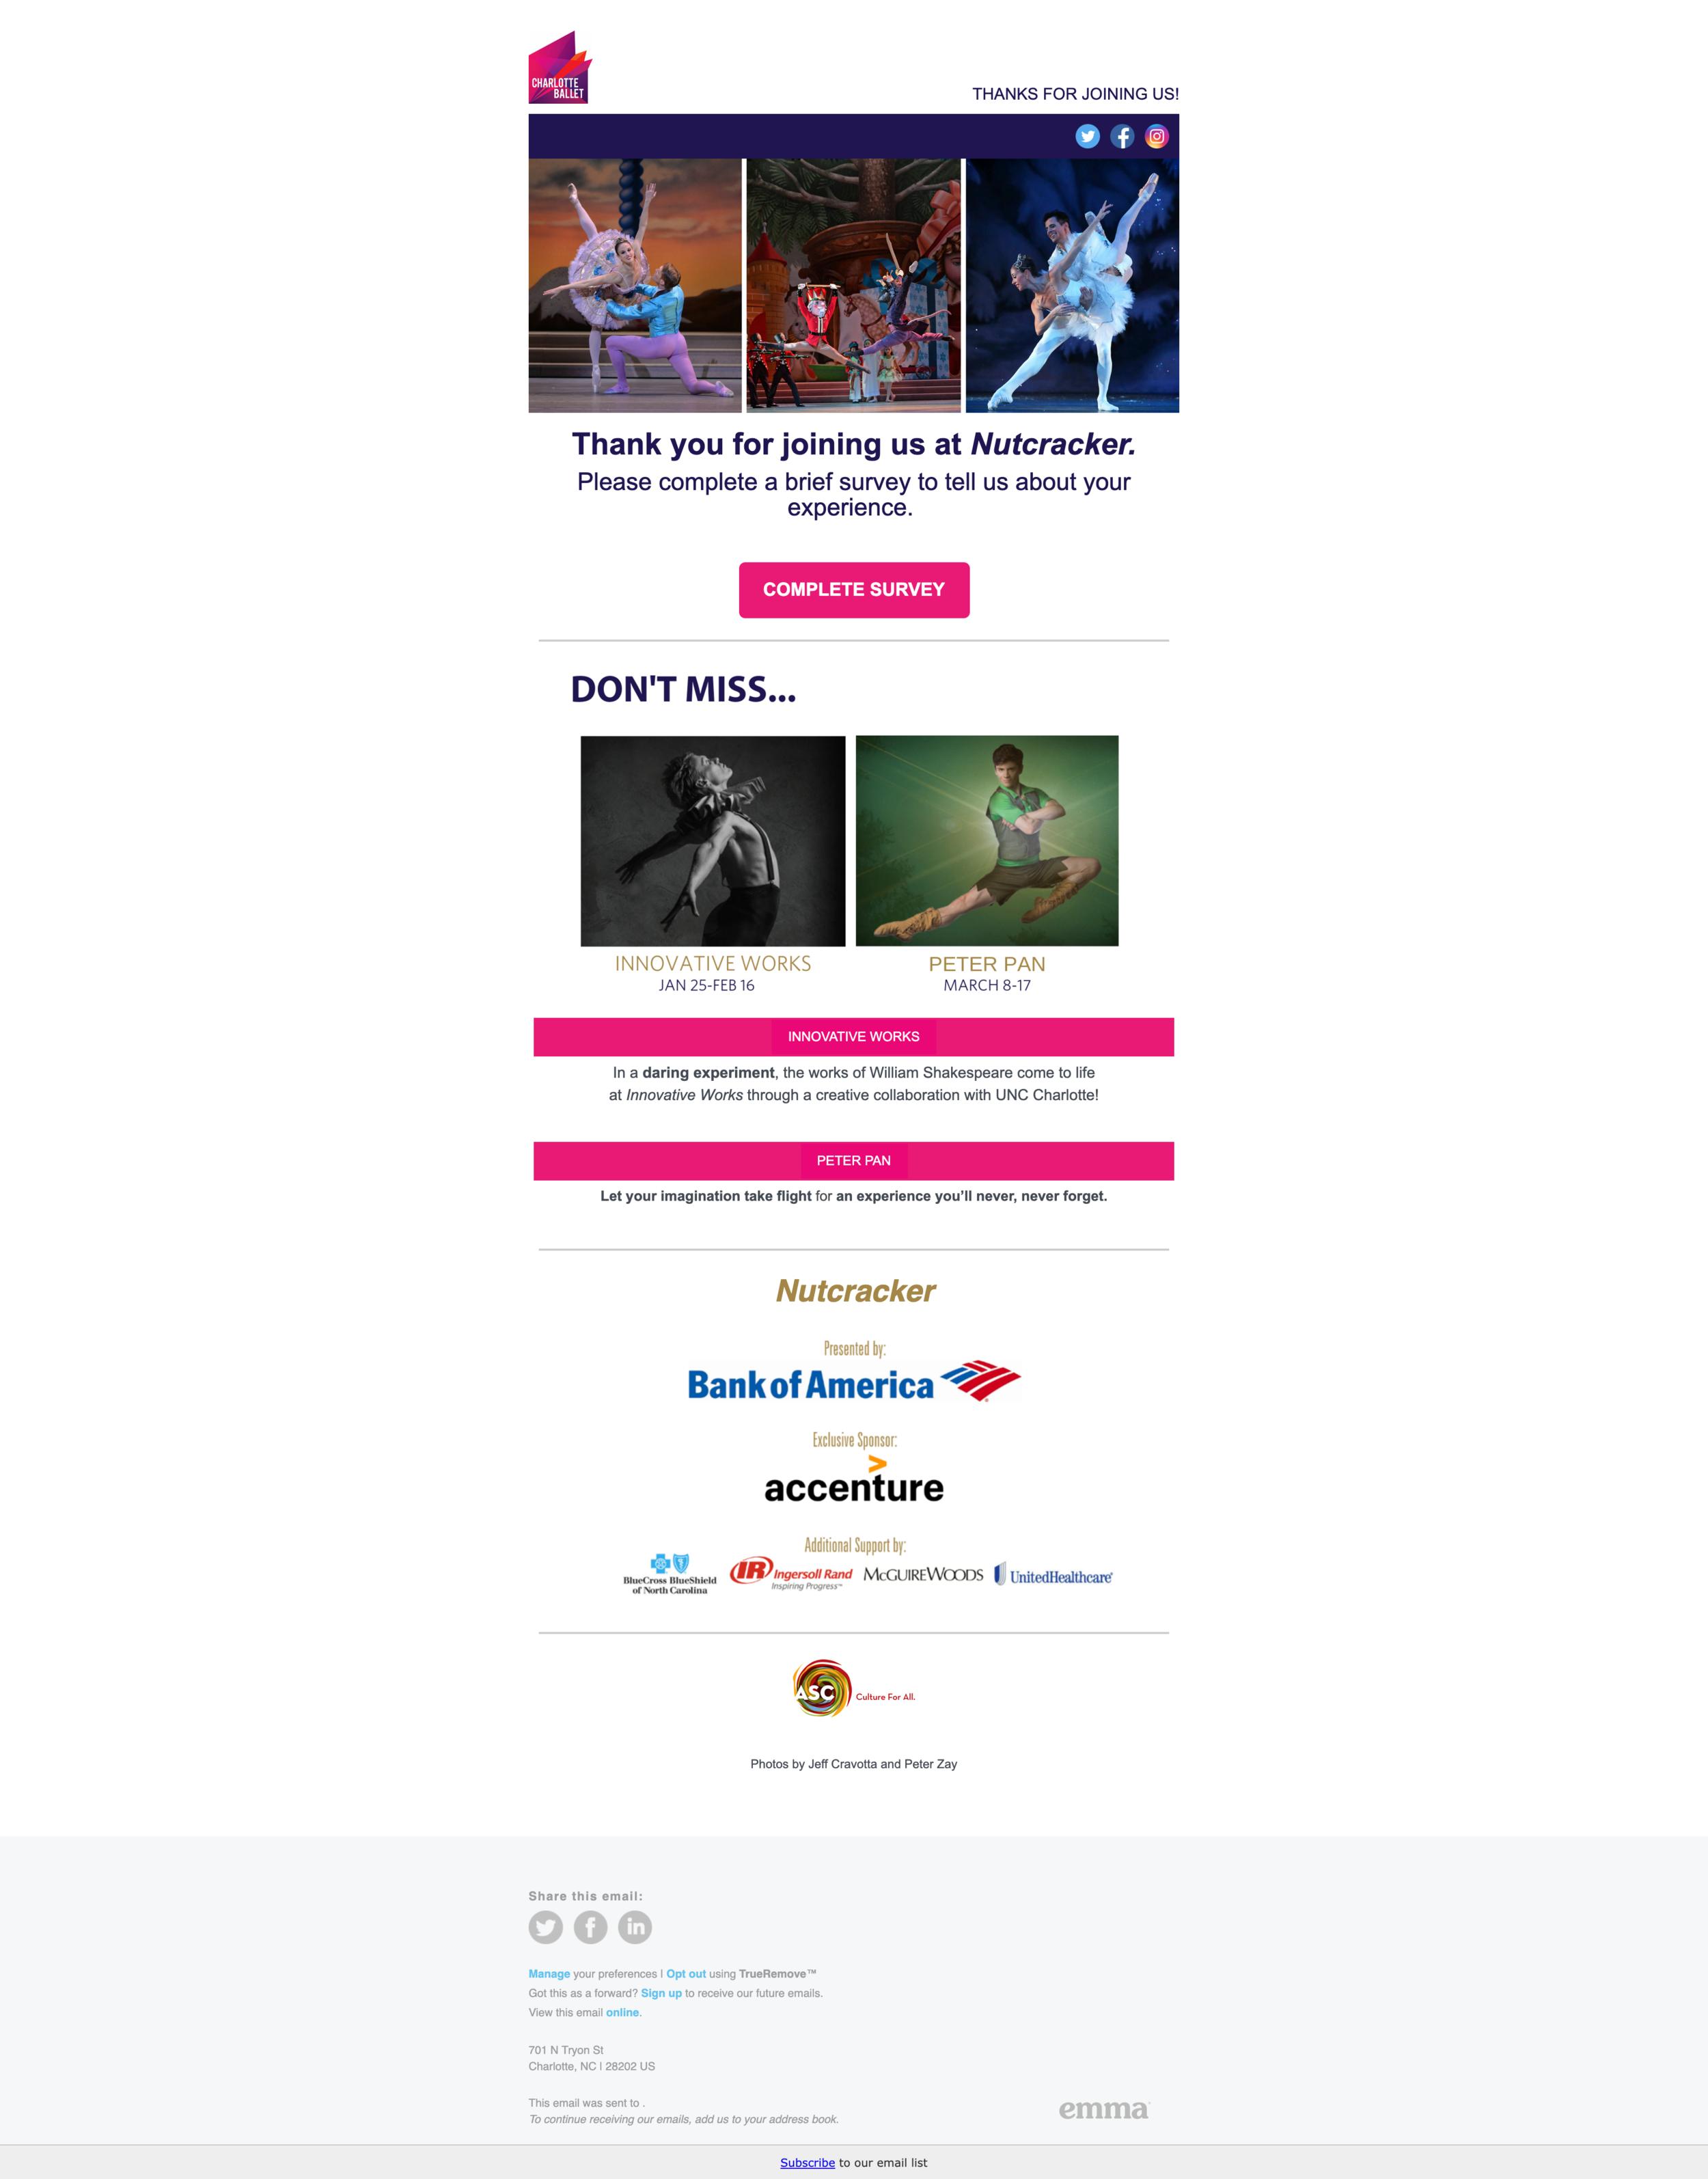 screencapture-t-e2ma-net-webview-1uo2ue-01d8db1a6e58db6cb9df7026805ebbf6-2019-04-14-11_56_13.png